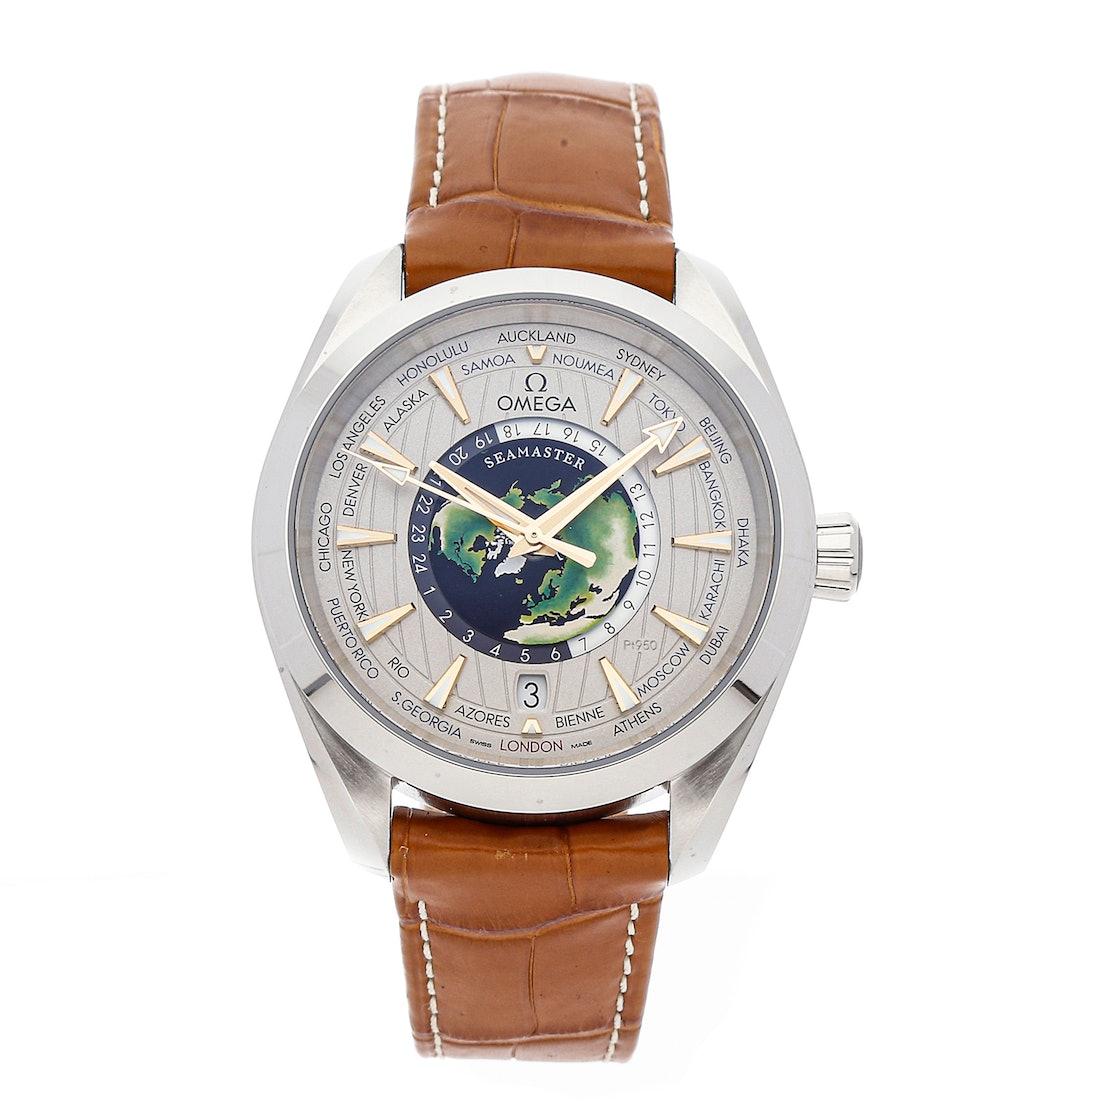 Omega Seamaster Aqua Terra 150m GMT Worldtimer 220.93.43.22.99.001